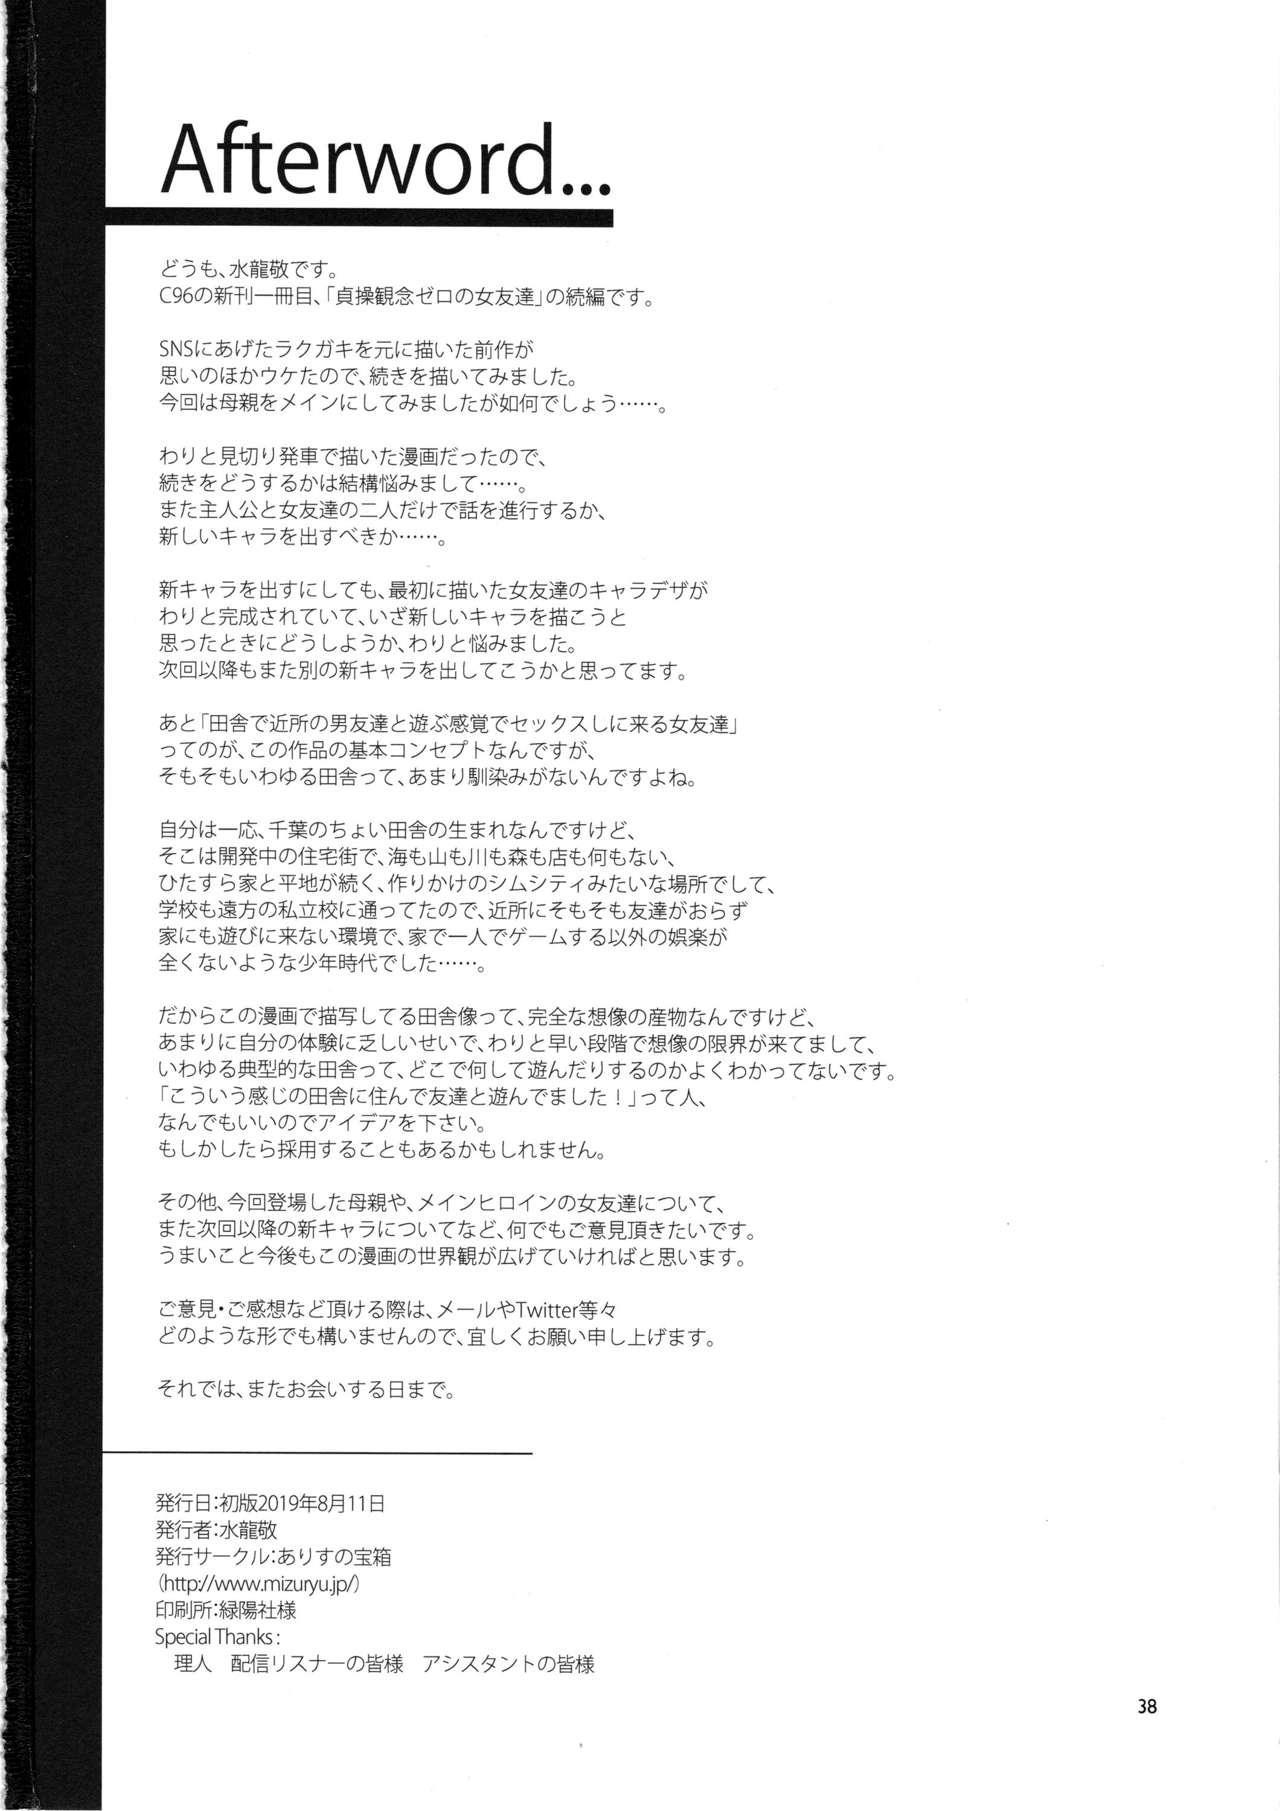 Teisou Kannen Zero no Onna Tomodachi no Haha 36